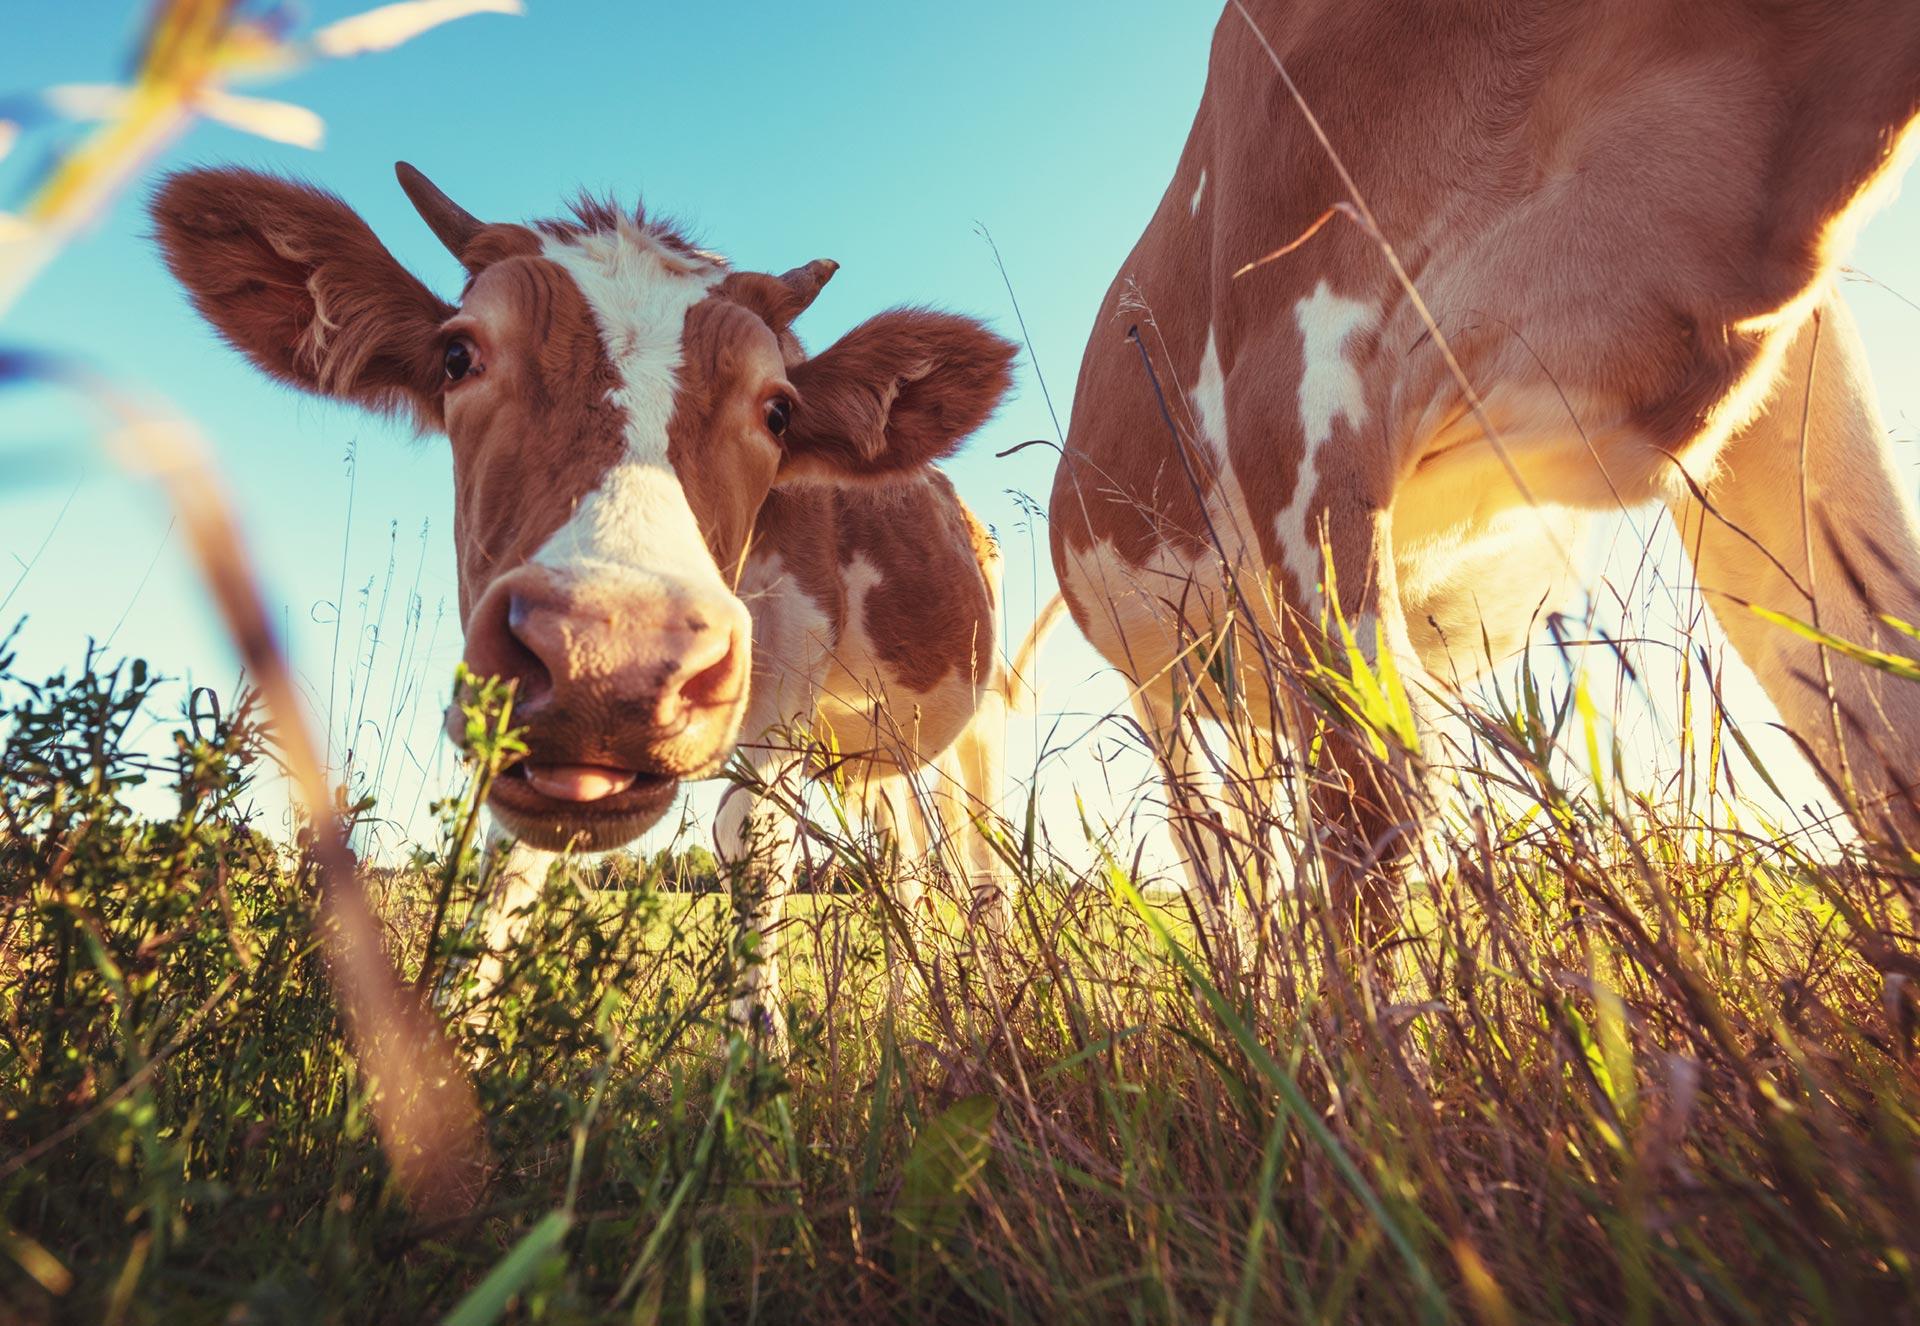 картинка корова жует траву цвета характерны для